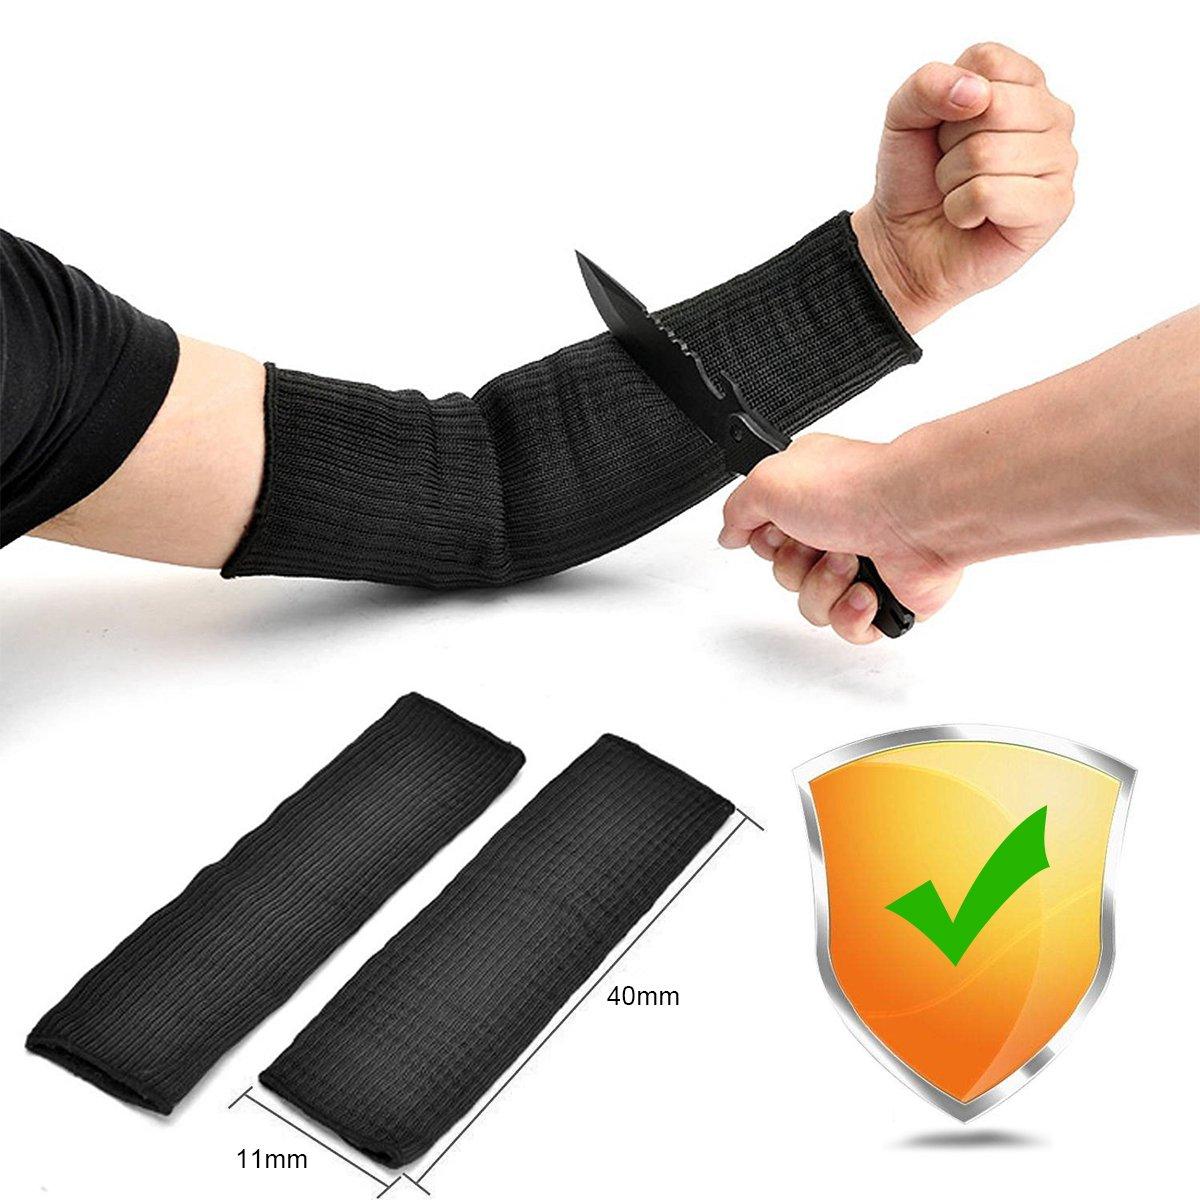 Arm Protection Sleeve, Ideapro Kevlar Sleeve 40cm Cut Resitant Burn Protective Anti Abrasion Safety Arm Guard for Garden Kitchen Farm Work 1 Pair (Black)